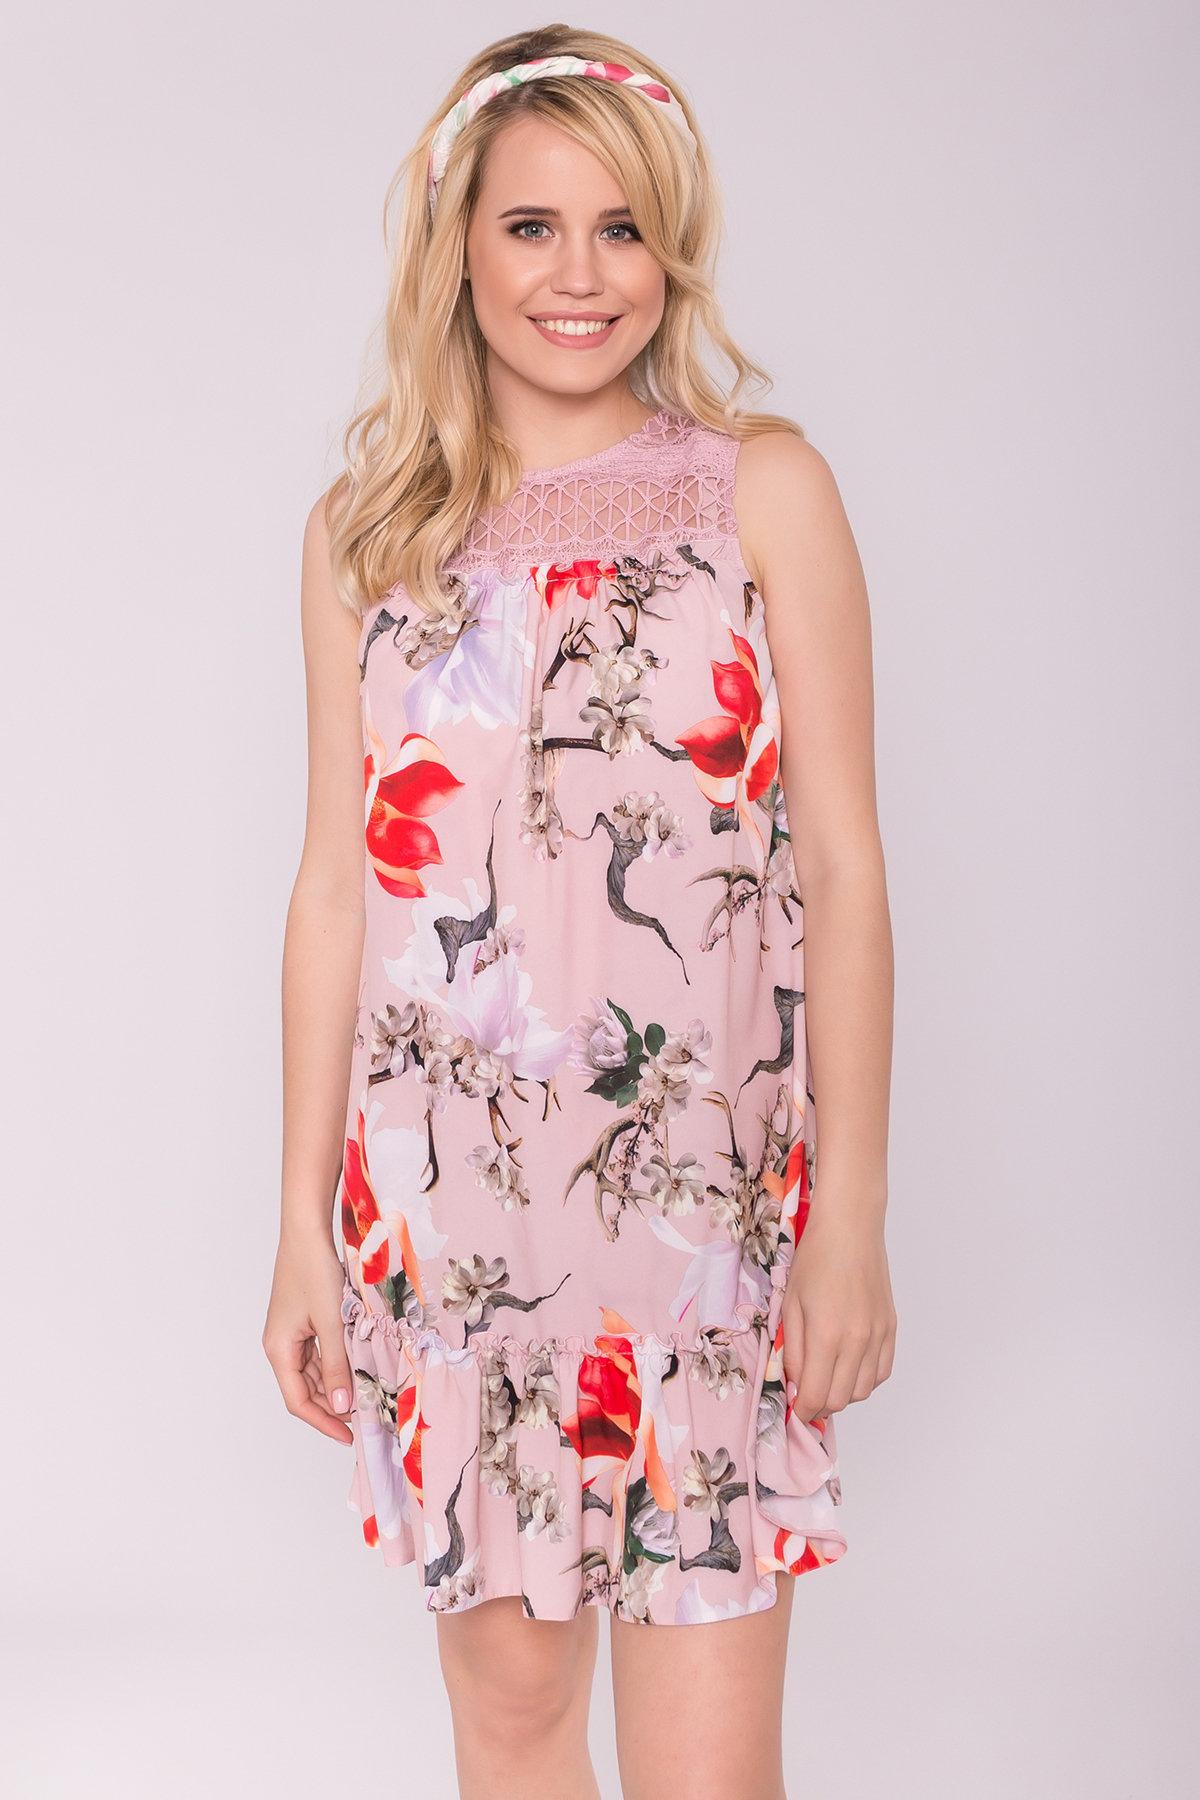 Платье Флеа 7112 АРТ. 42796 Цвет: цветы комби пудра/ коралл - фото 3, интернет магазин tm-modus.ru